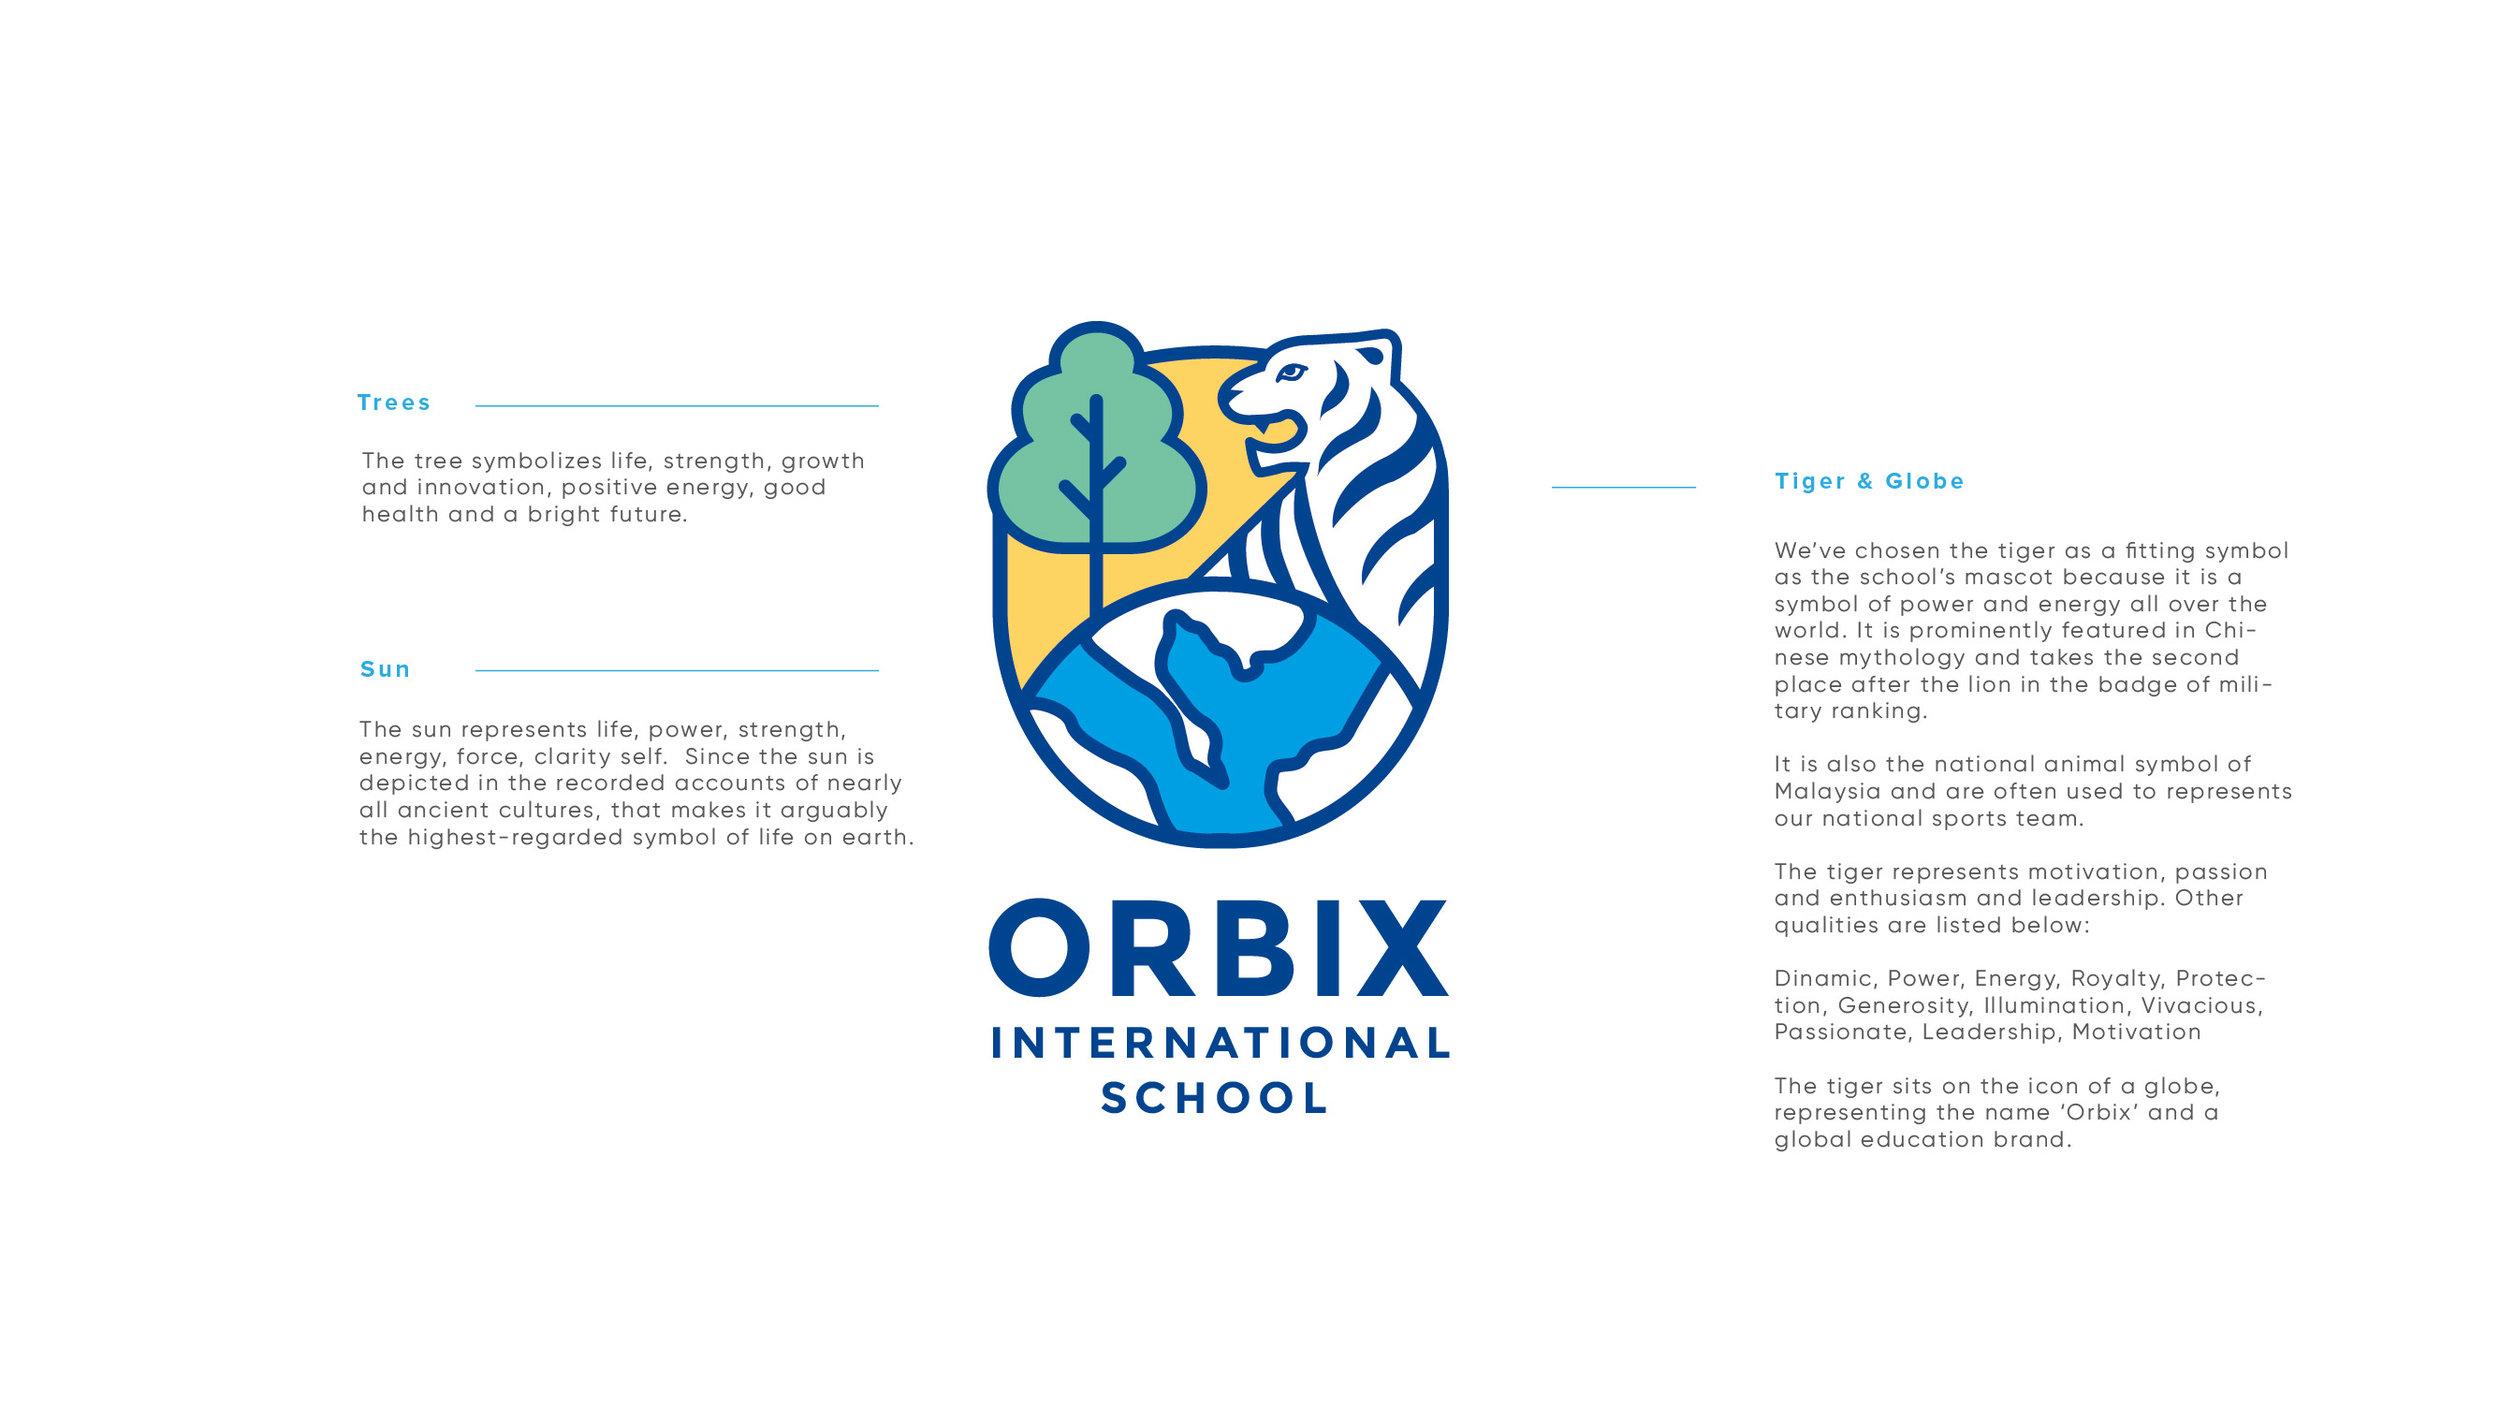 Orbix_Logo Rationale-13-13.jpg